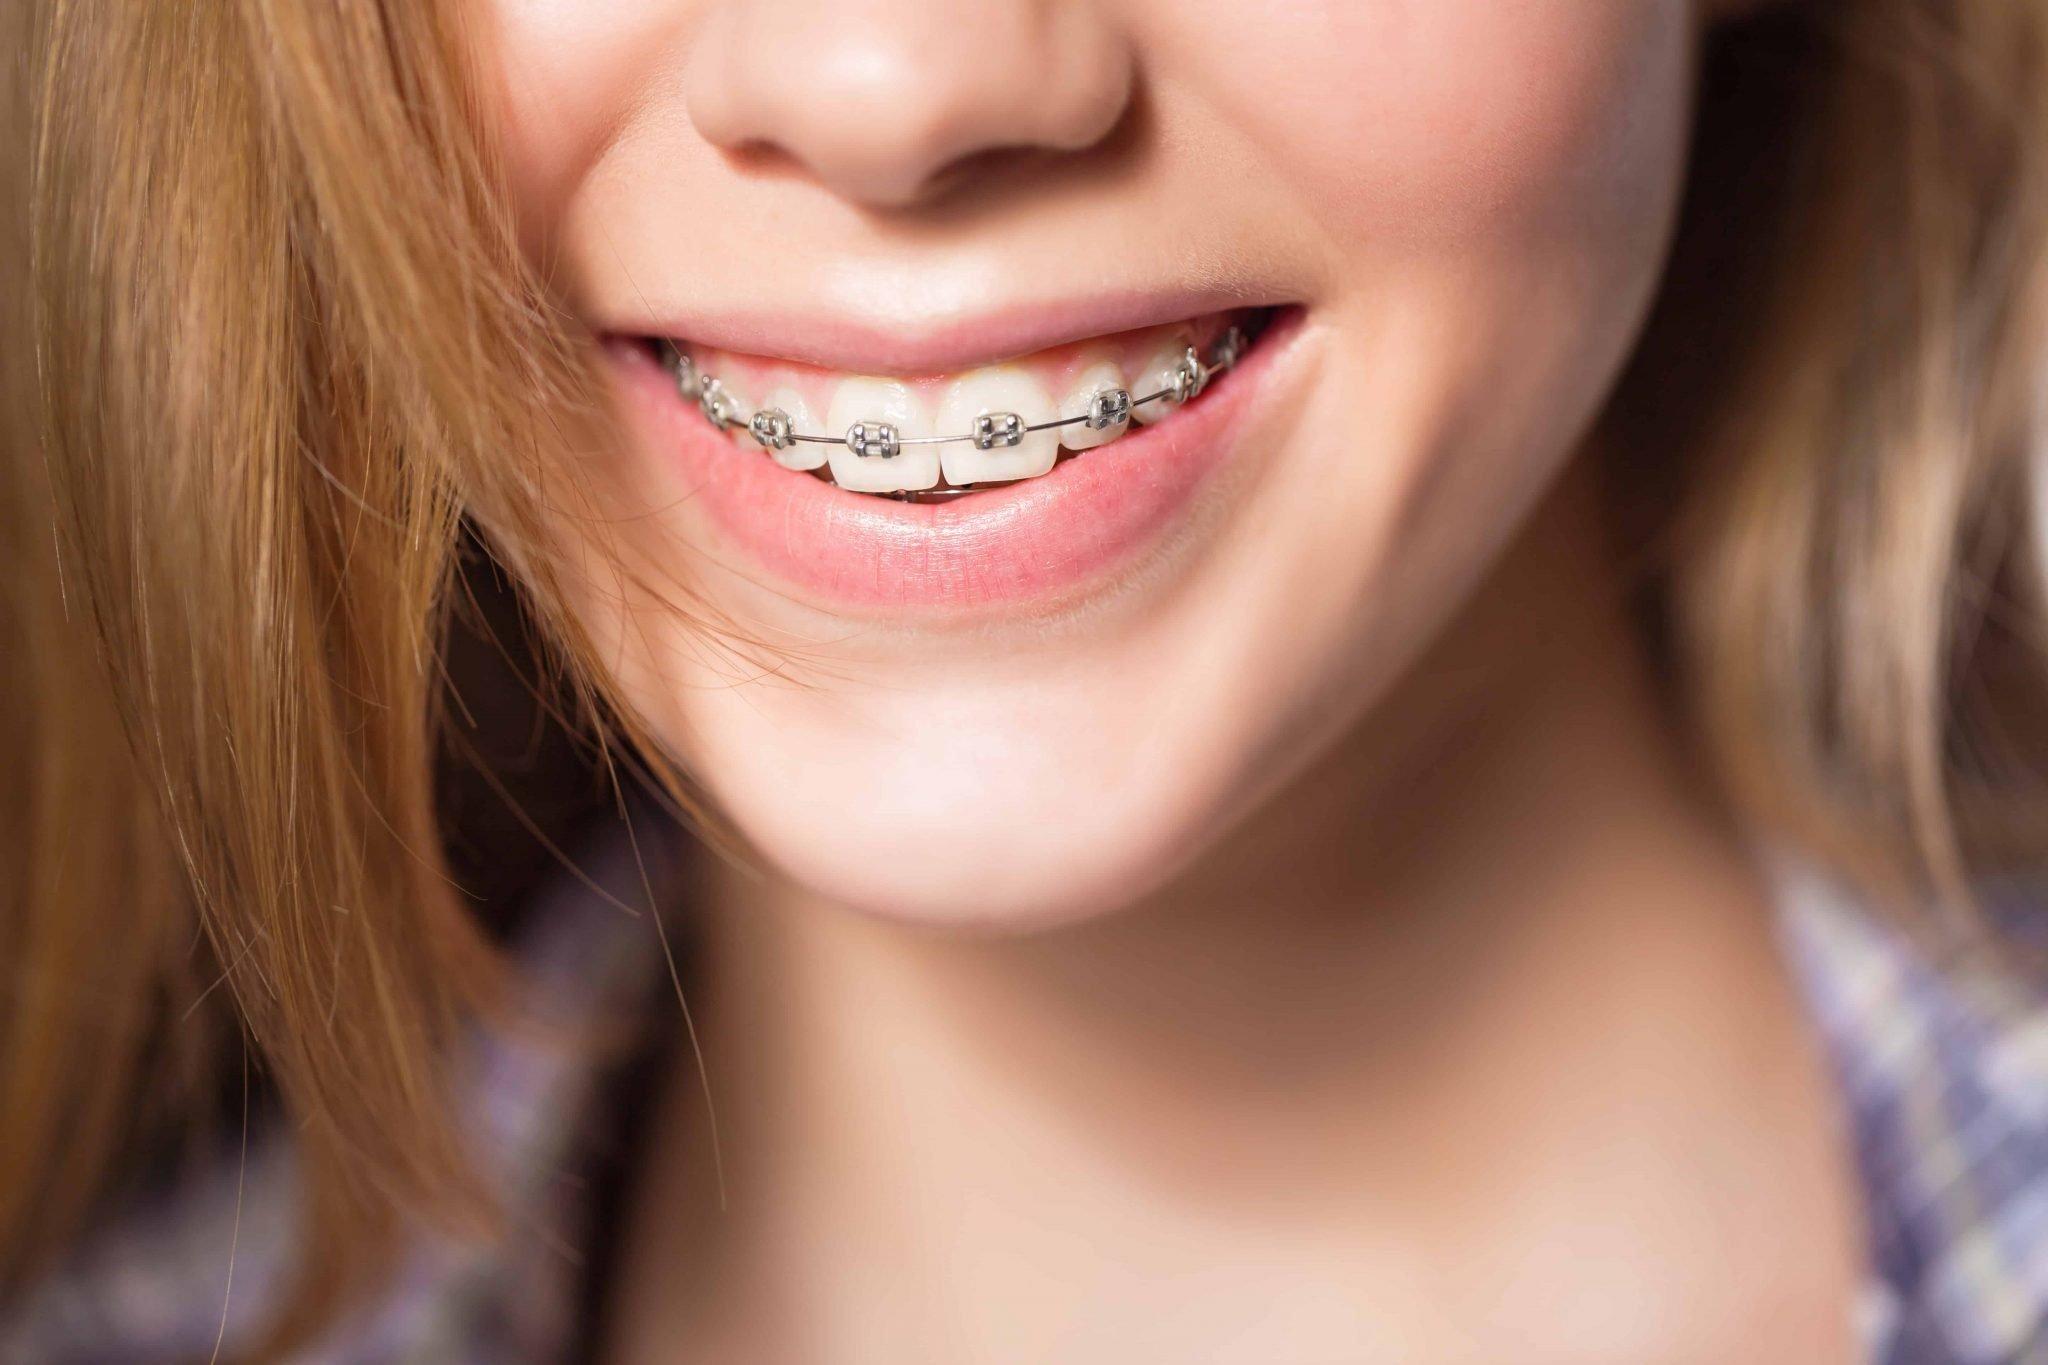 Orthodontics teenagers Montreal